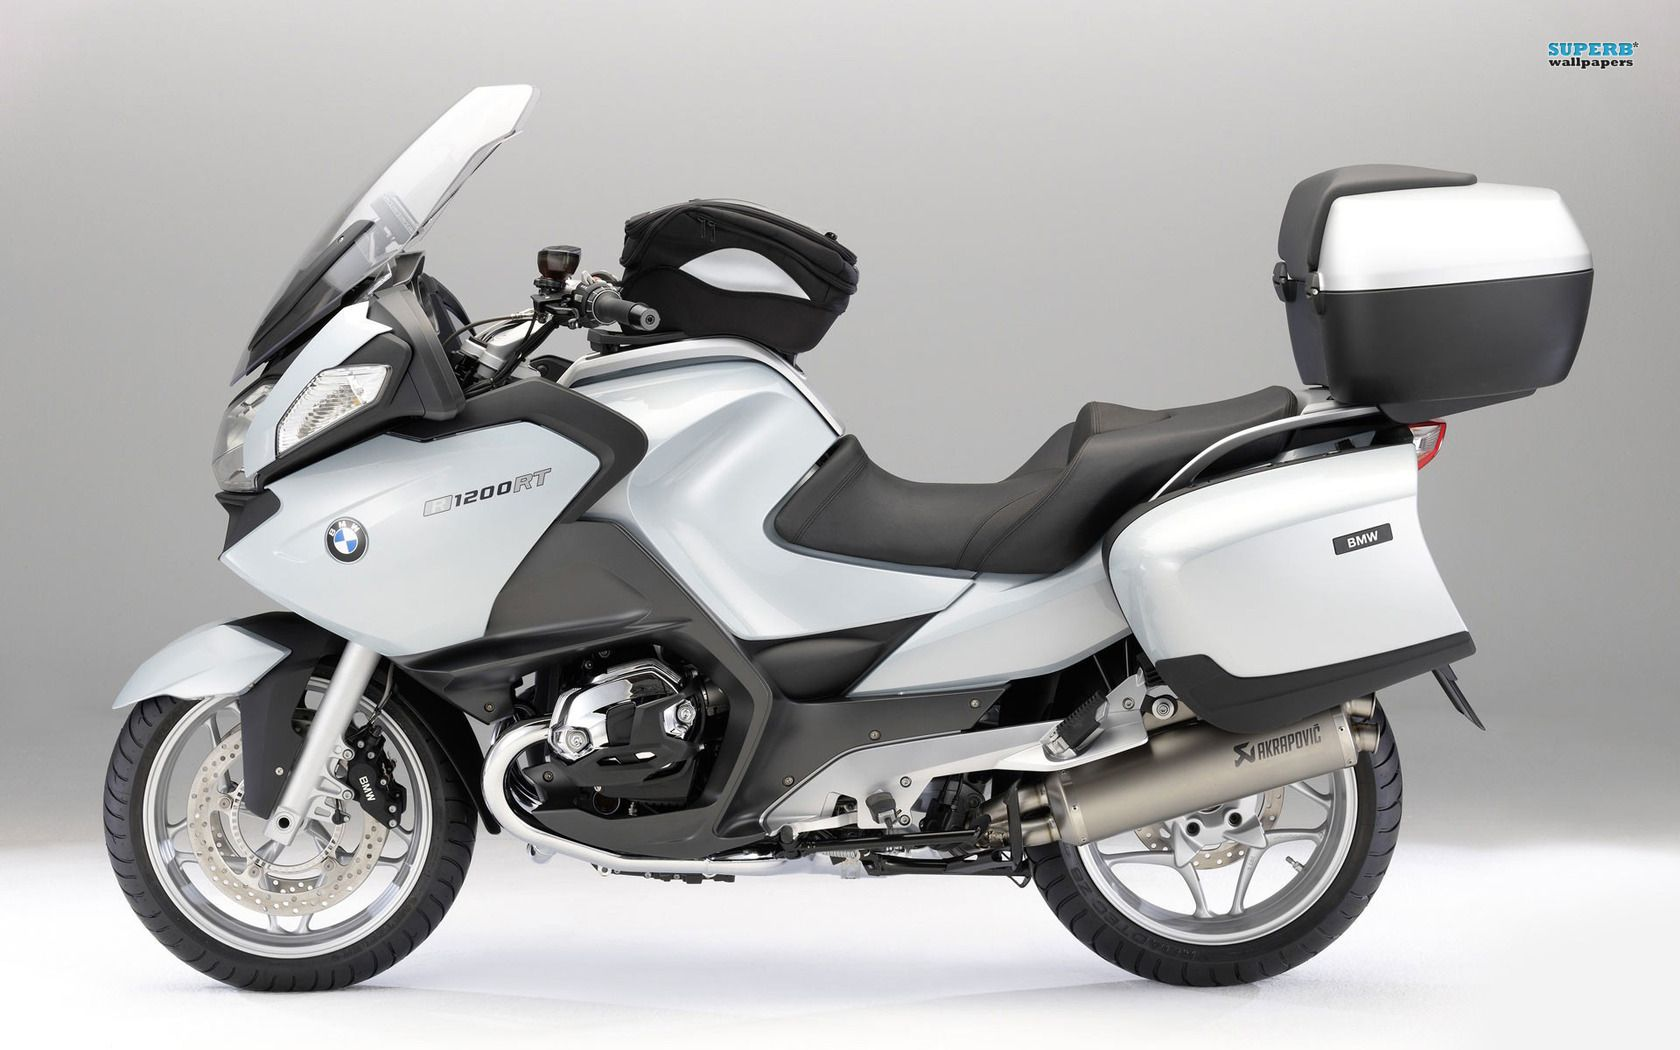 51 en iyi bmw r1200rt 2006 g r nt s 2019 bmw r1200rt motorbikes rh pinterest com